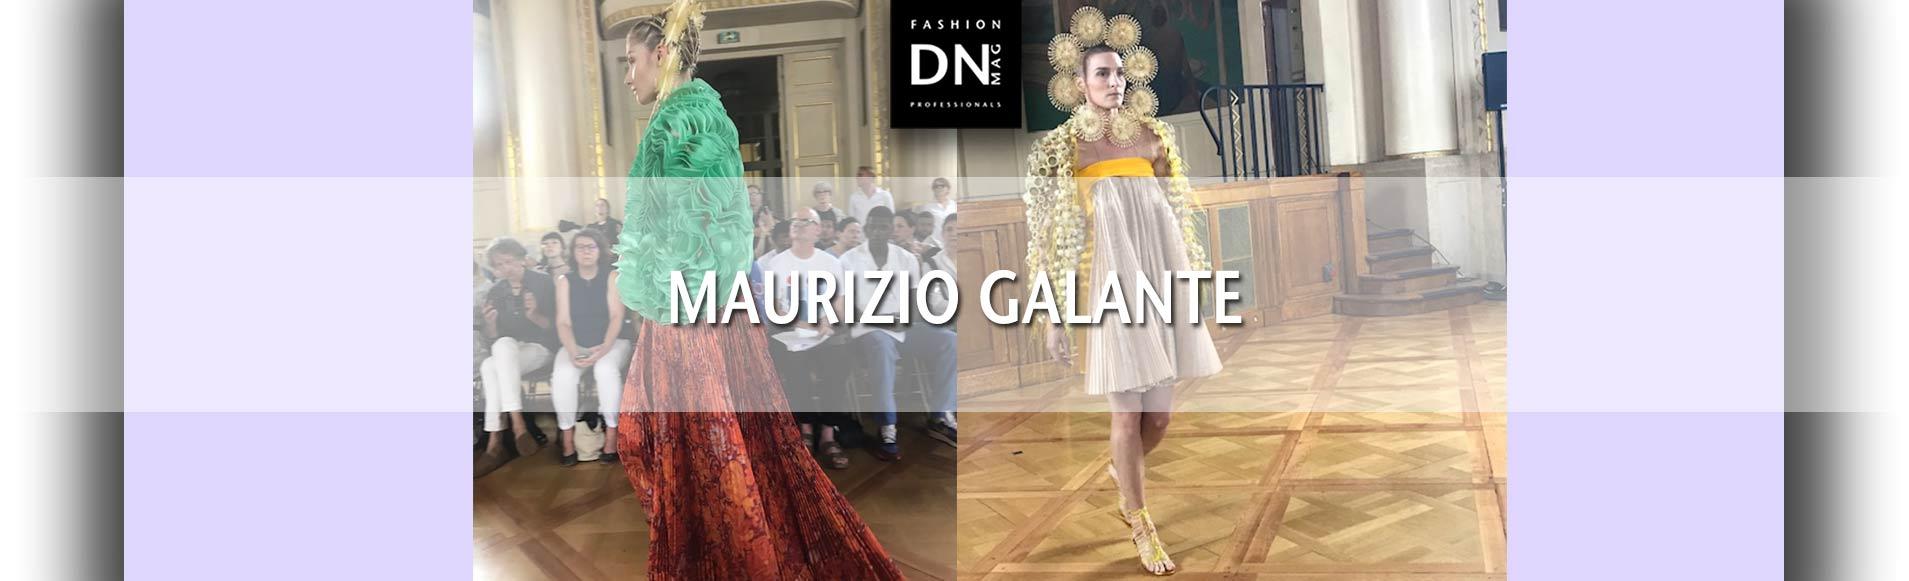 MAURIZIO-GALANTE-FALL-WINTER-2019-20-DNMAG